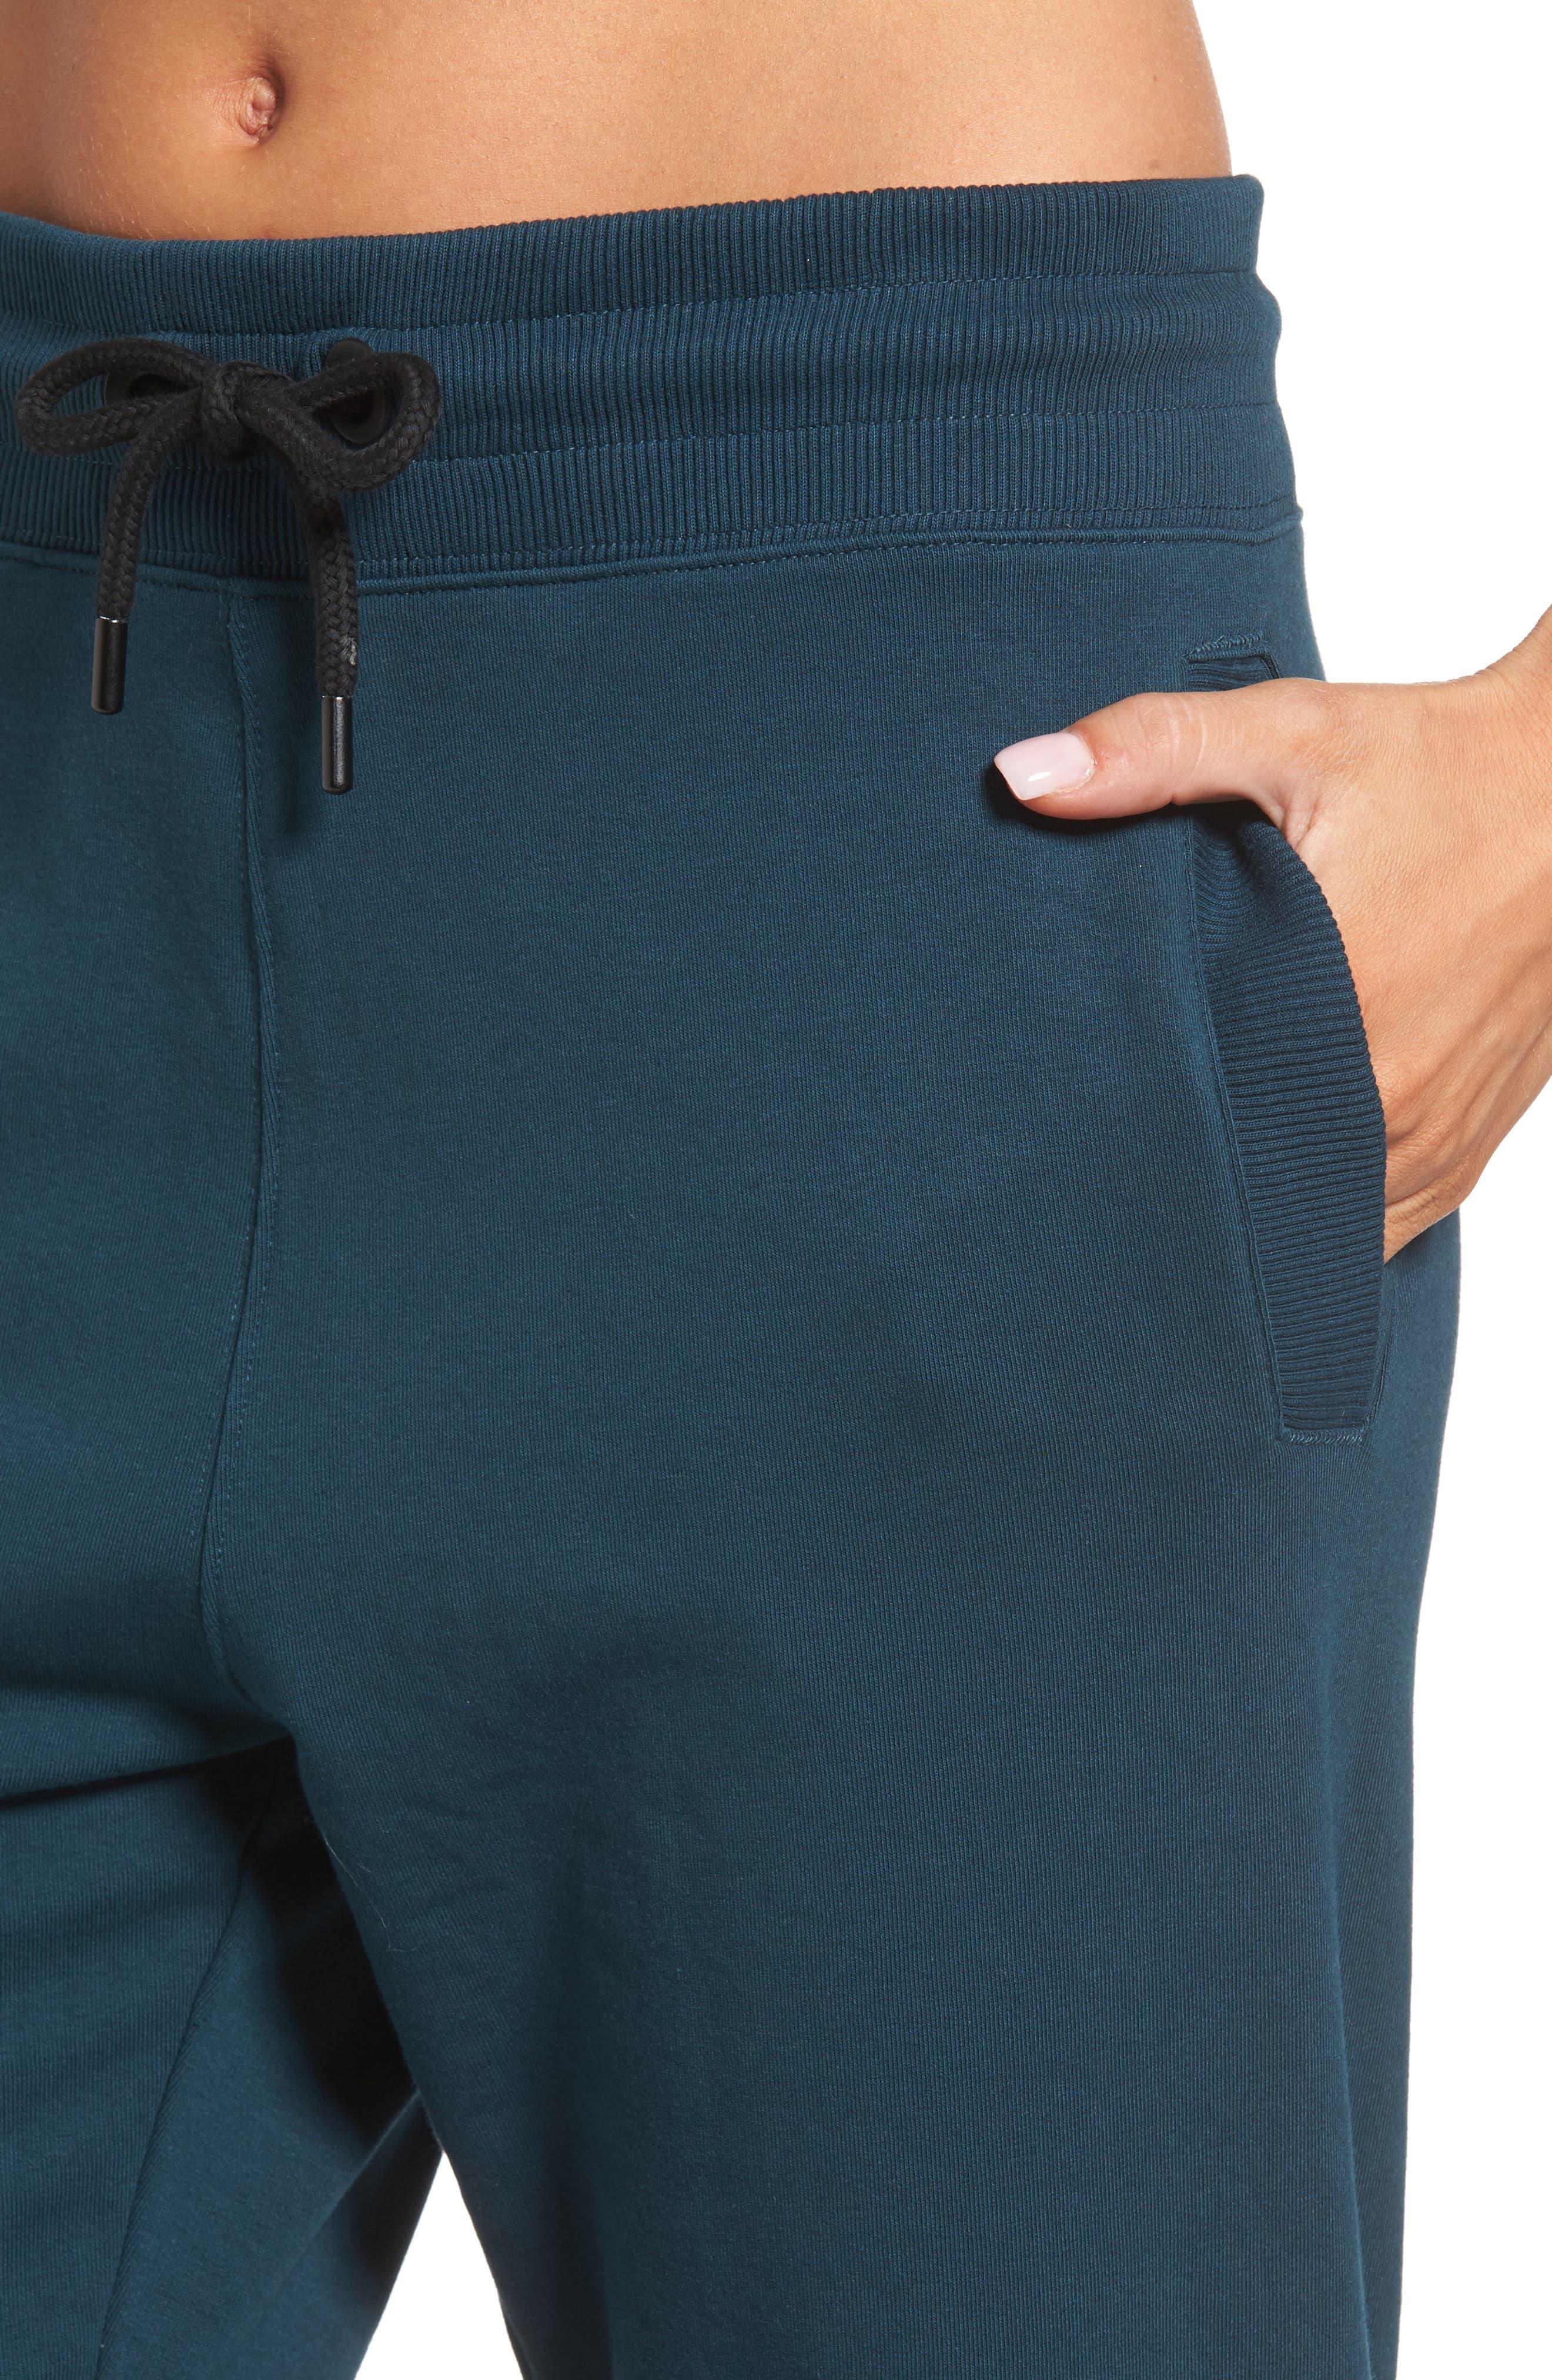 Logo Jogger Pants,                             Alternate thumbnail 4, color,                             440